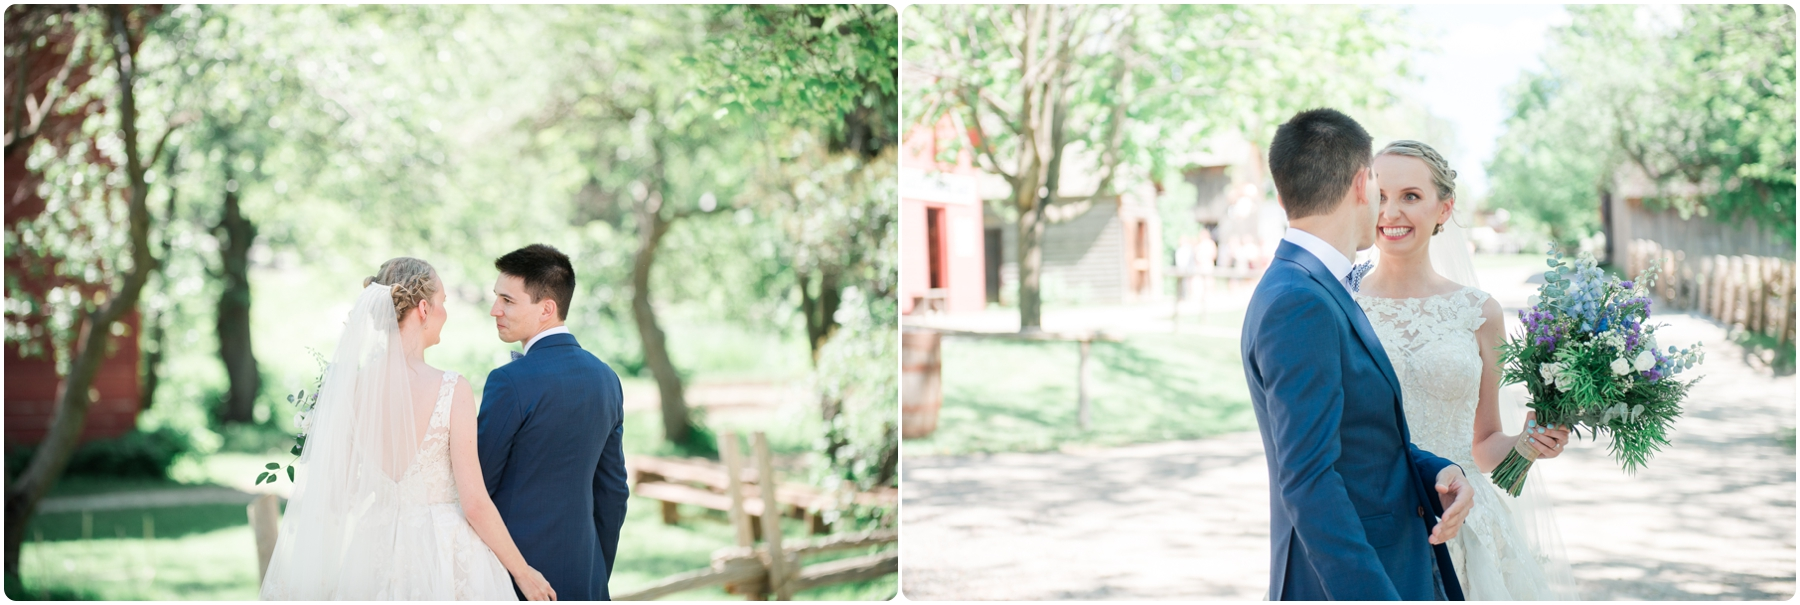 Black Creek Pioneer Village Wedding- Agata & Chris_0192